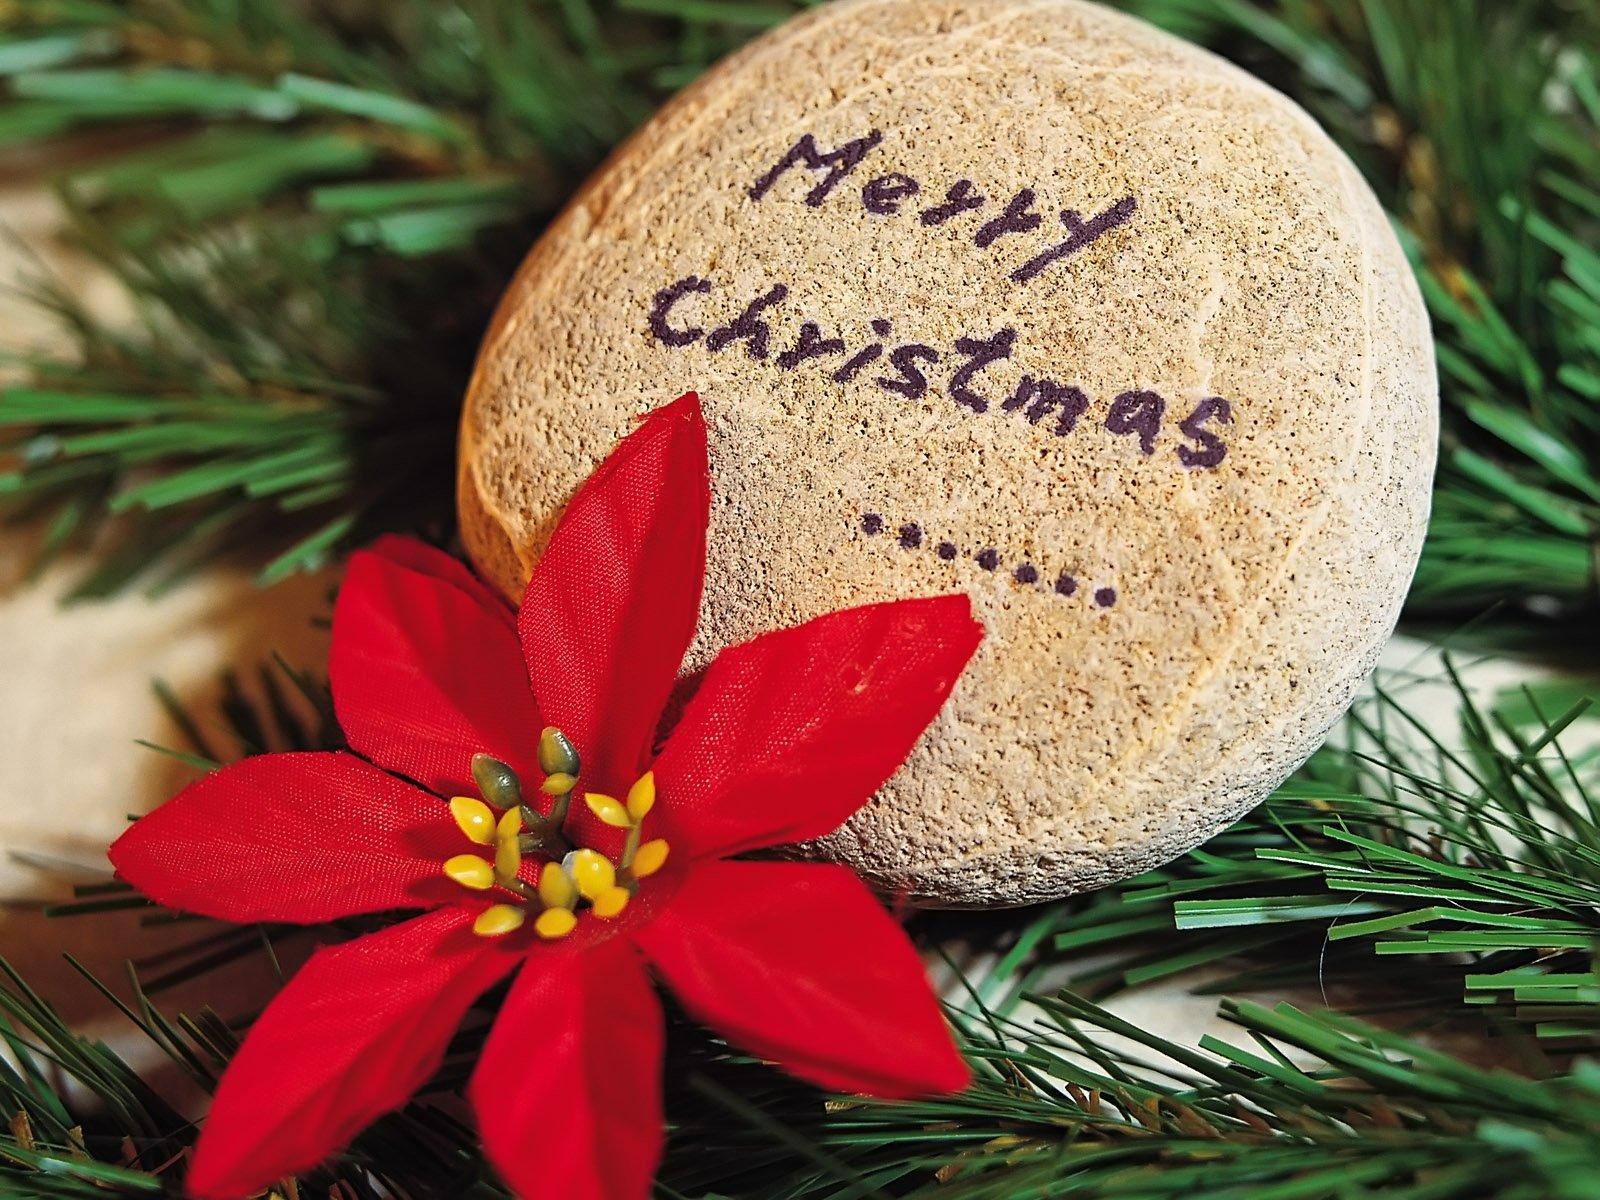 Wallpaper 1600x1200 Px Beautiful Christmas Gifts Happy Holiday Lights Merry Santa Snowman Tree Vacation 1600x1200 Wallbase 1315637 Hd Wallpapers Wallhere